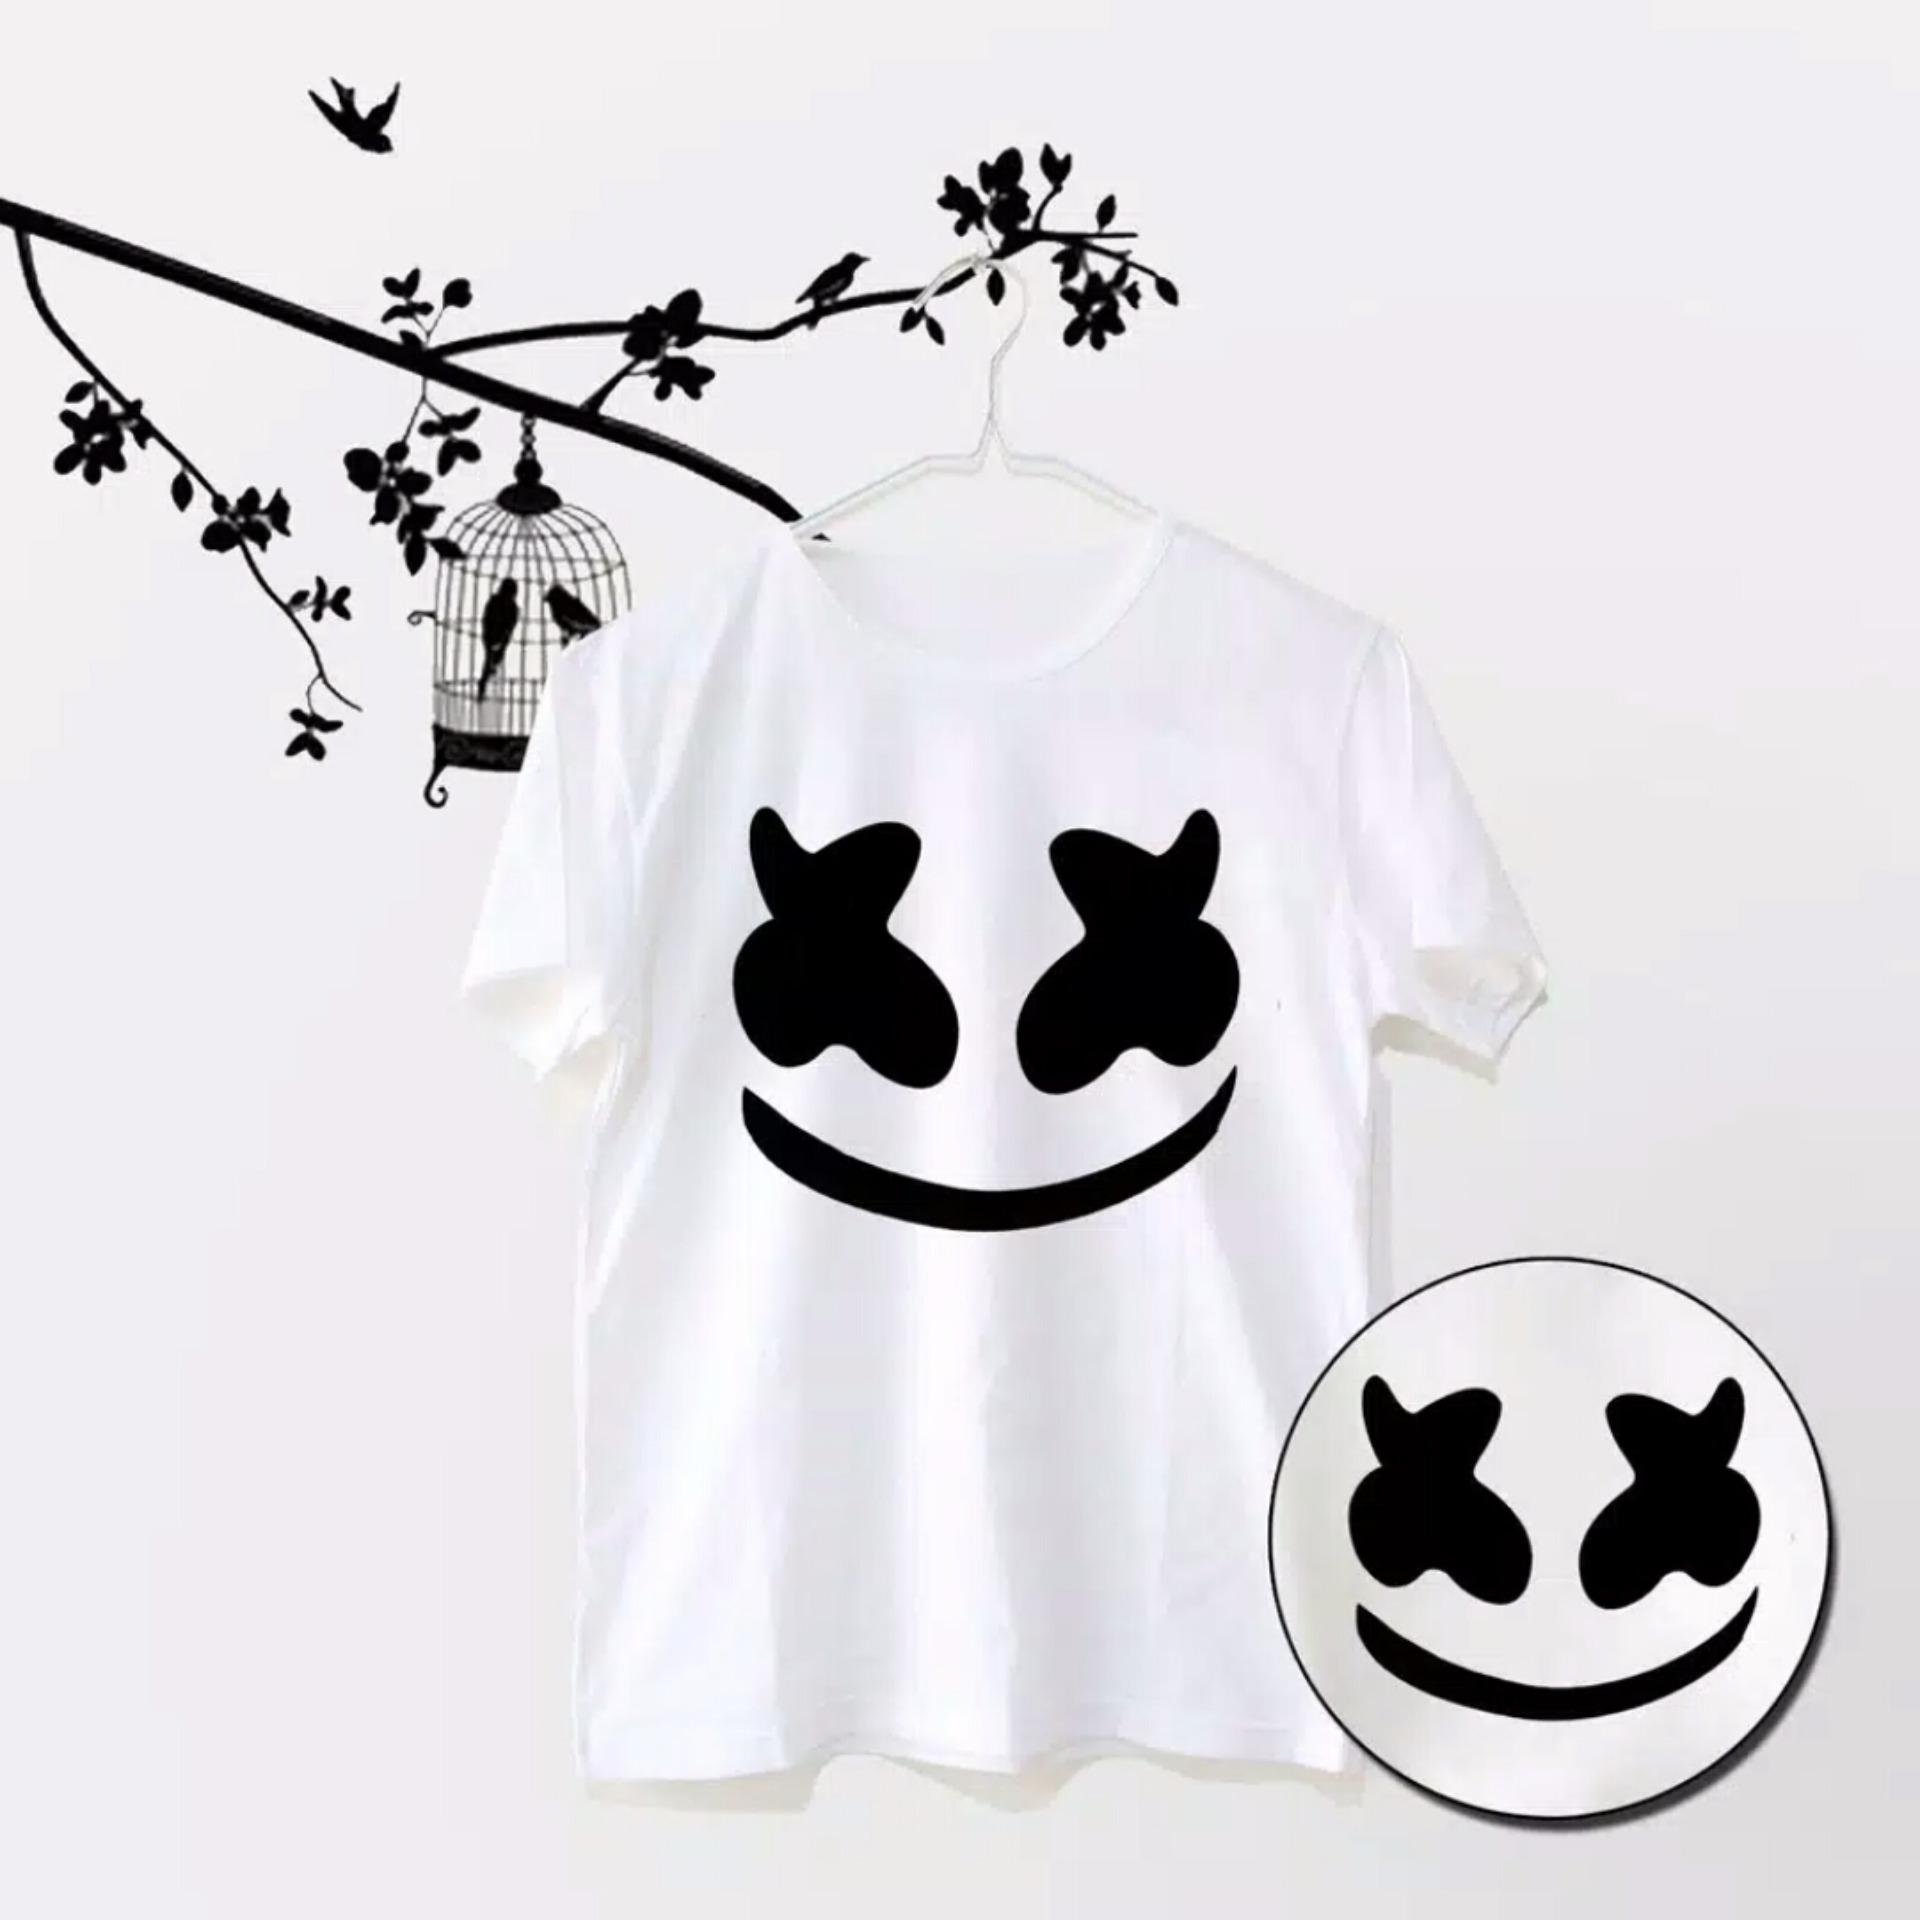 Toko T Shirt Tumblr Kaos Dj Marshmello Tshirt Marshmello Cewek Cowok Marshmallow Lengkap